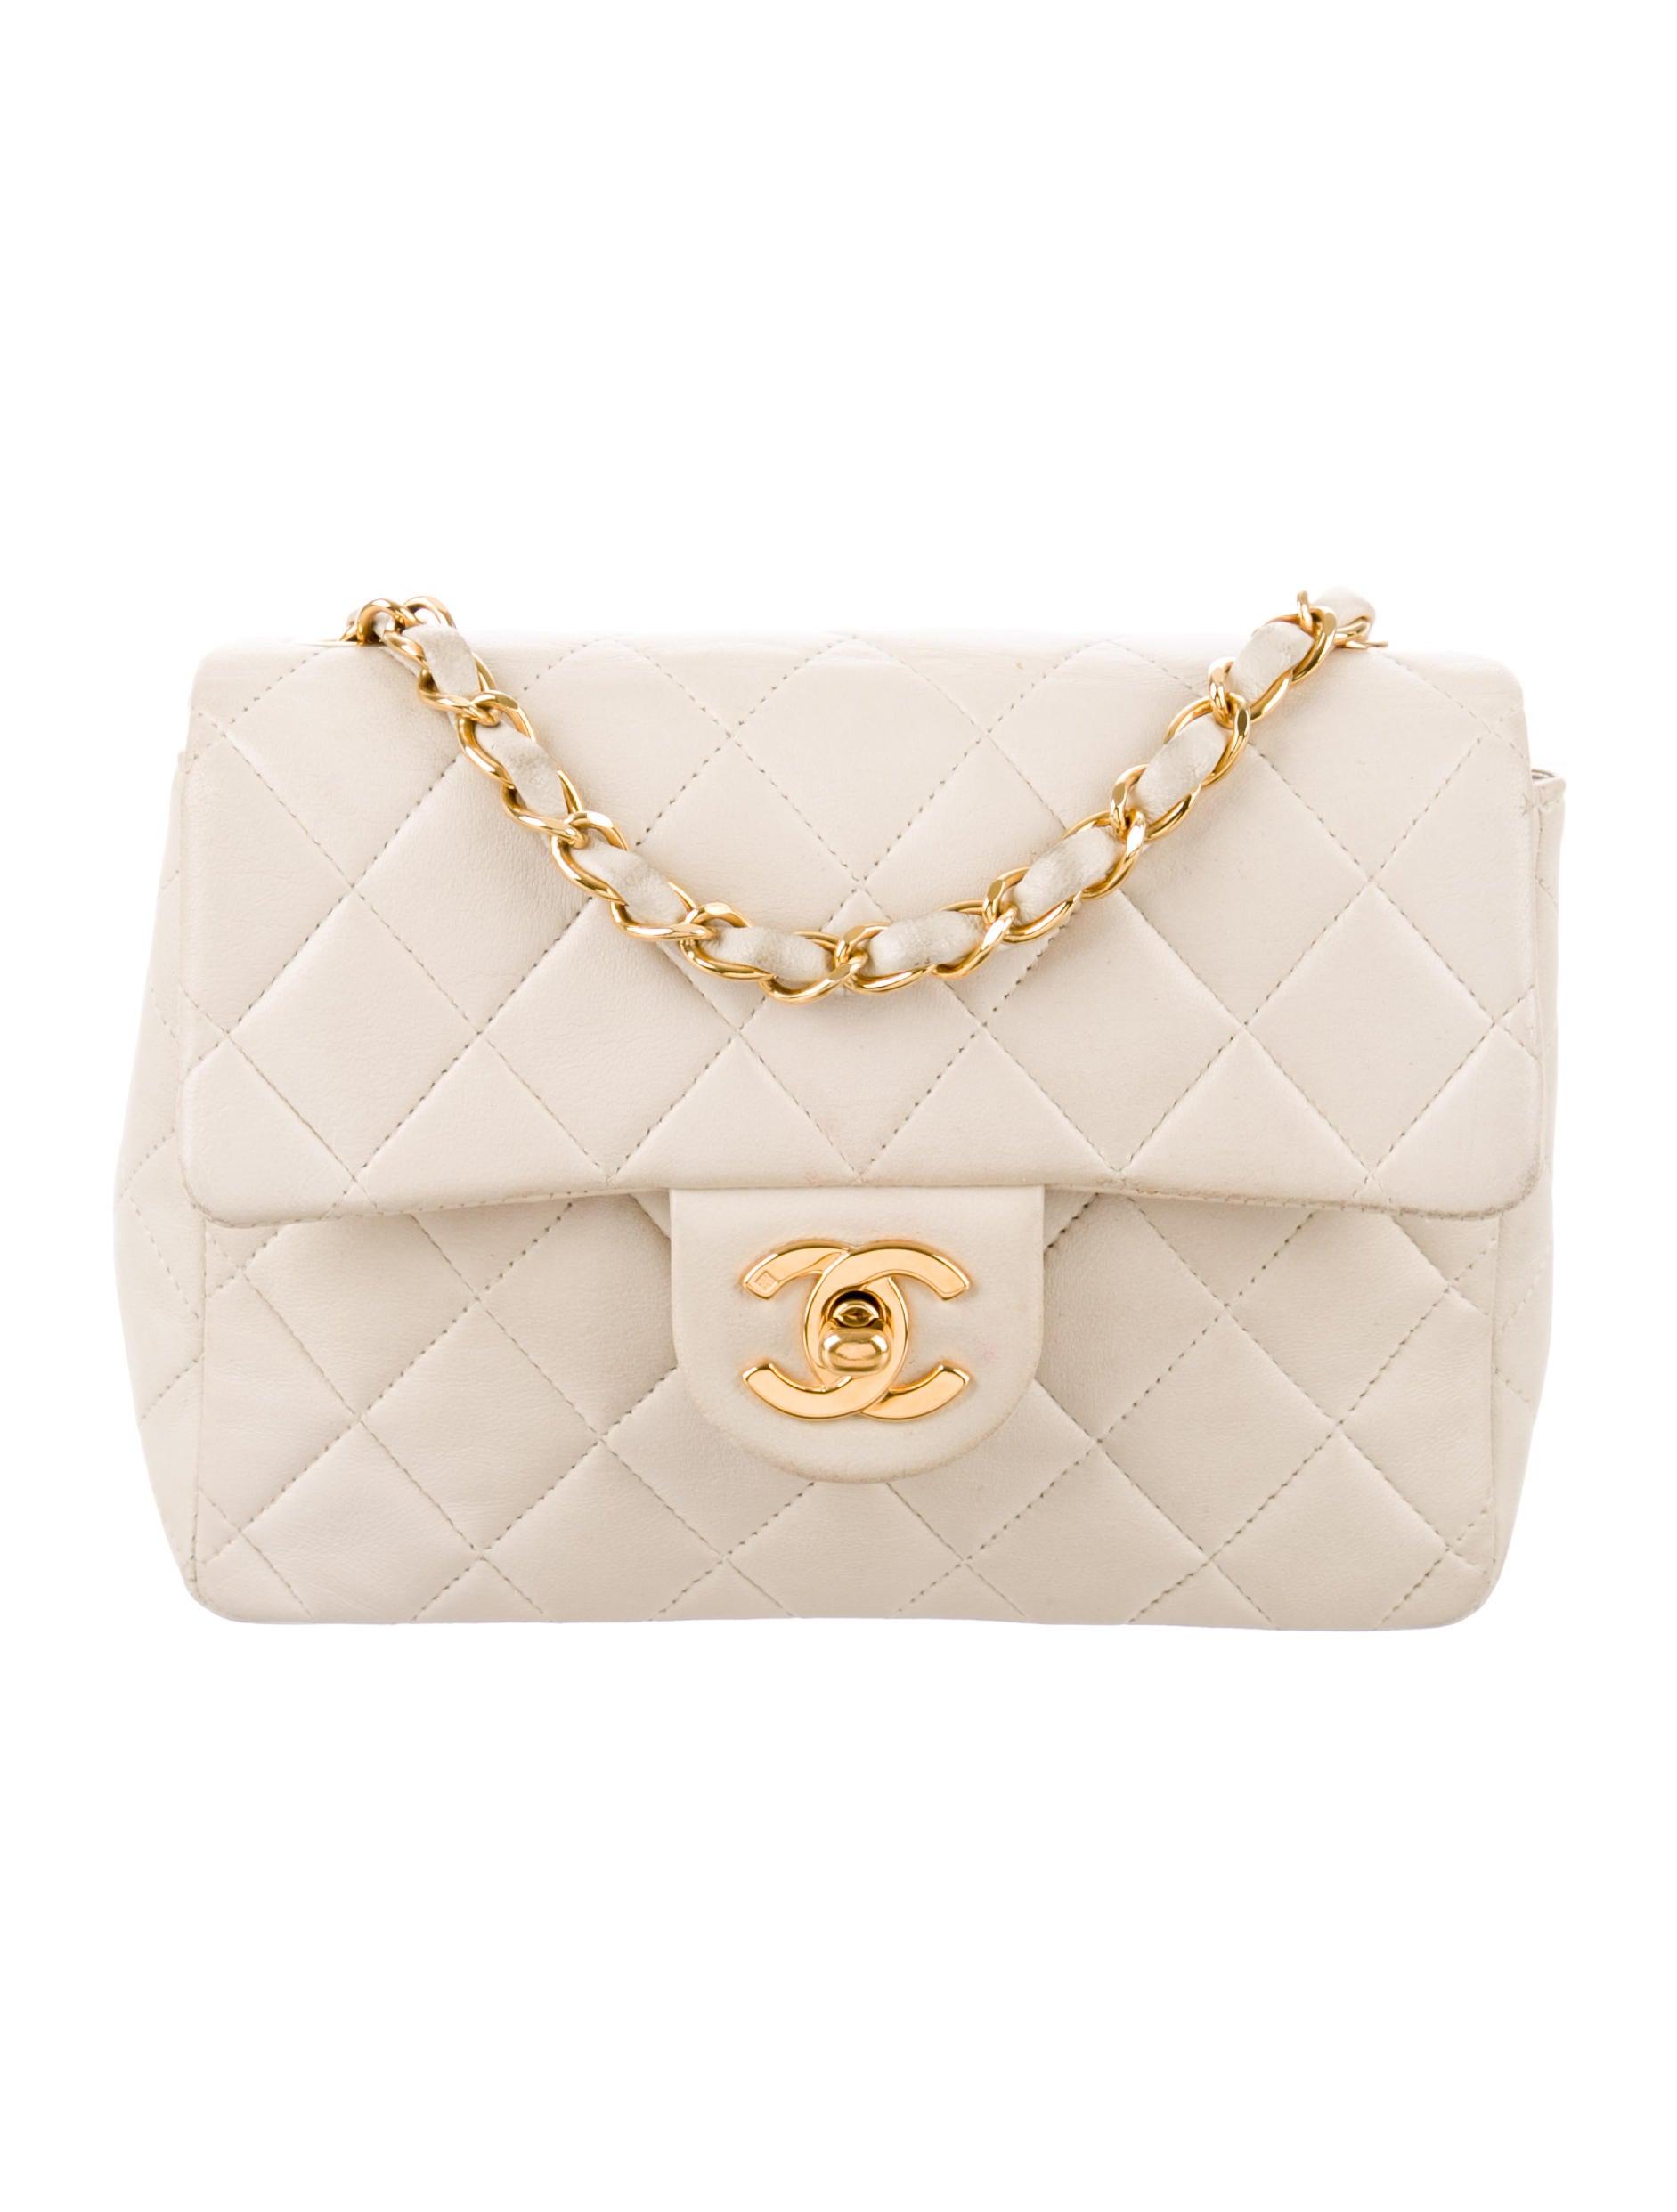 4e51316ffd420c Chanel Vintage Classic Mini Square Flap Bag - Handbags - CHA273855 ...